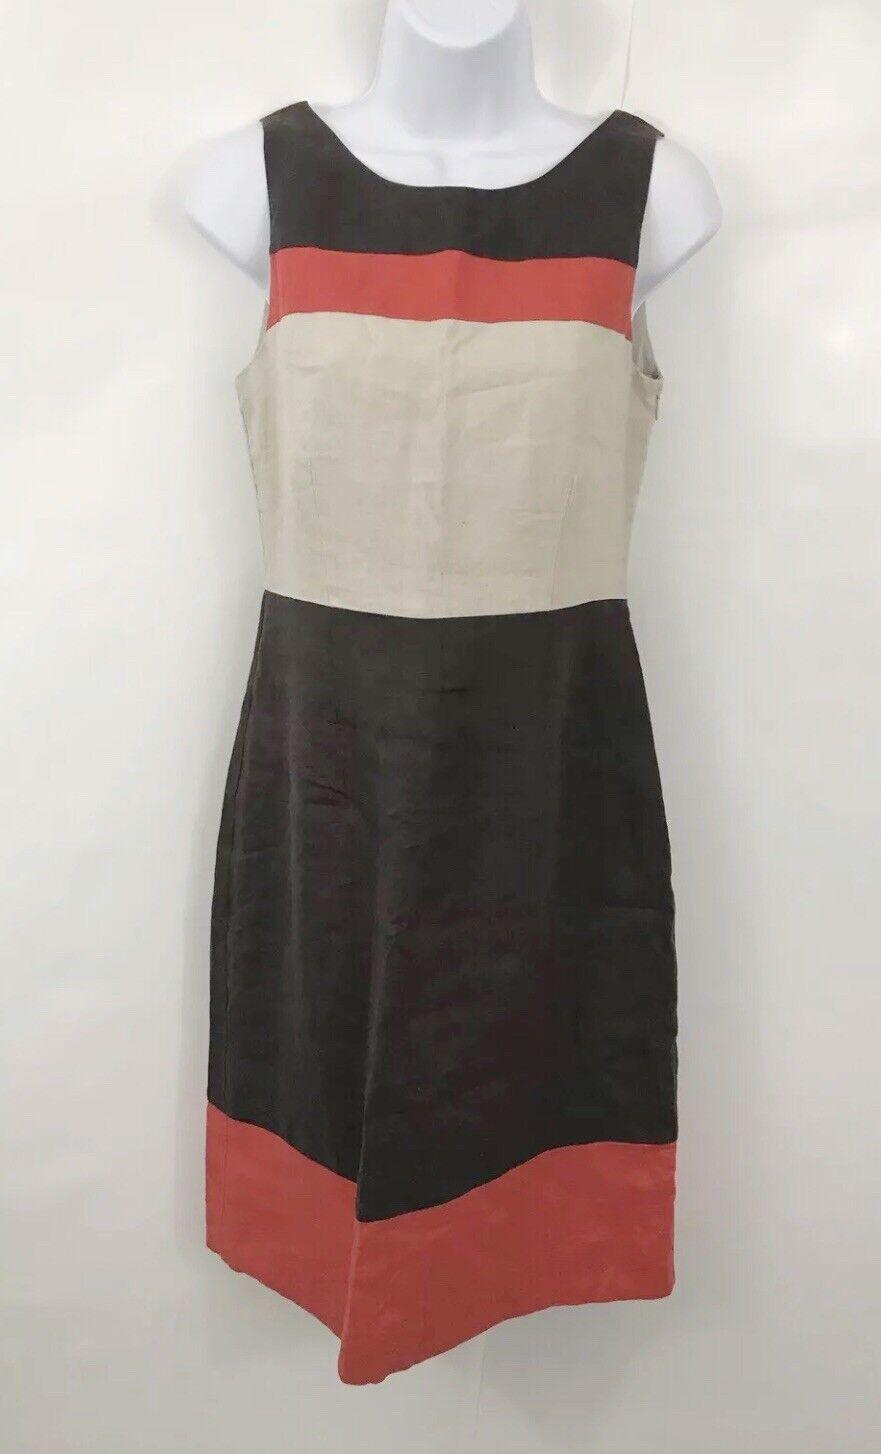 Ladies Laura Ashley Summer Linen Tea Dress Size 8 Beige orange Brown Lined